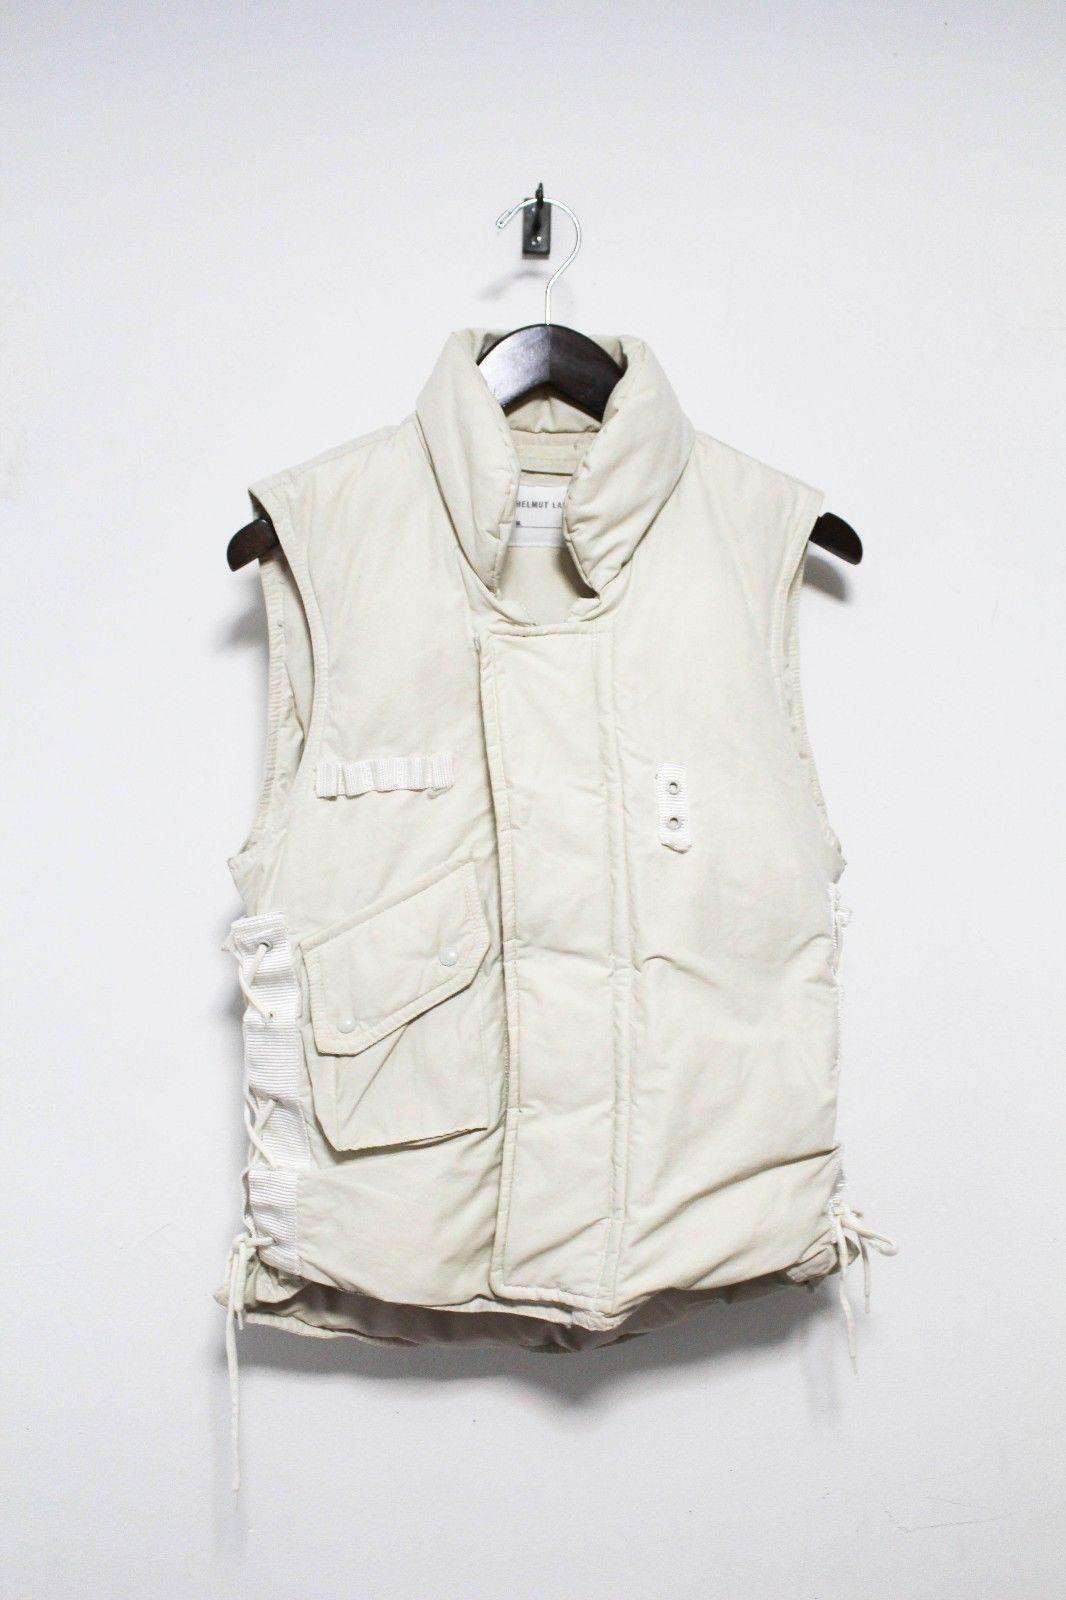 Helmut Lang Fw 1999 Vintage Archive Goosedown Military Vest Jacket Workwear Vintage Military Vest Jacket Helmut Lang